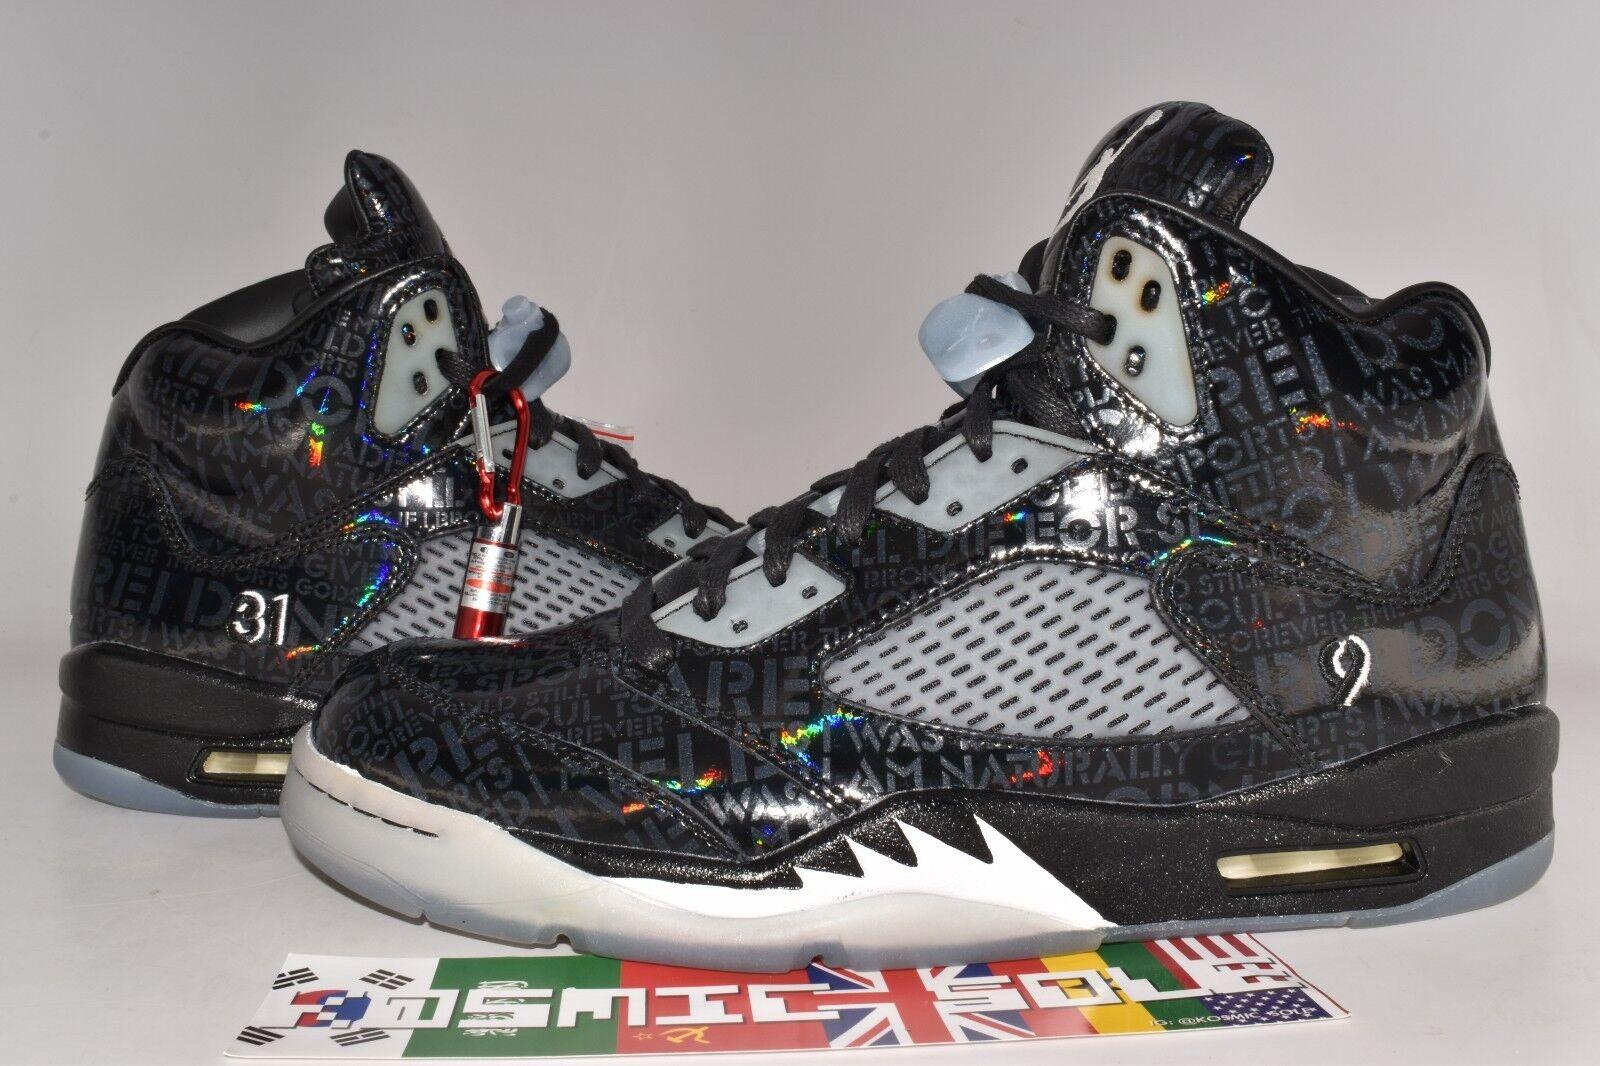 Nike Air Jordan 5 Retro DB 2013 Style Size 10.5